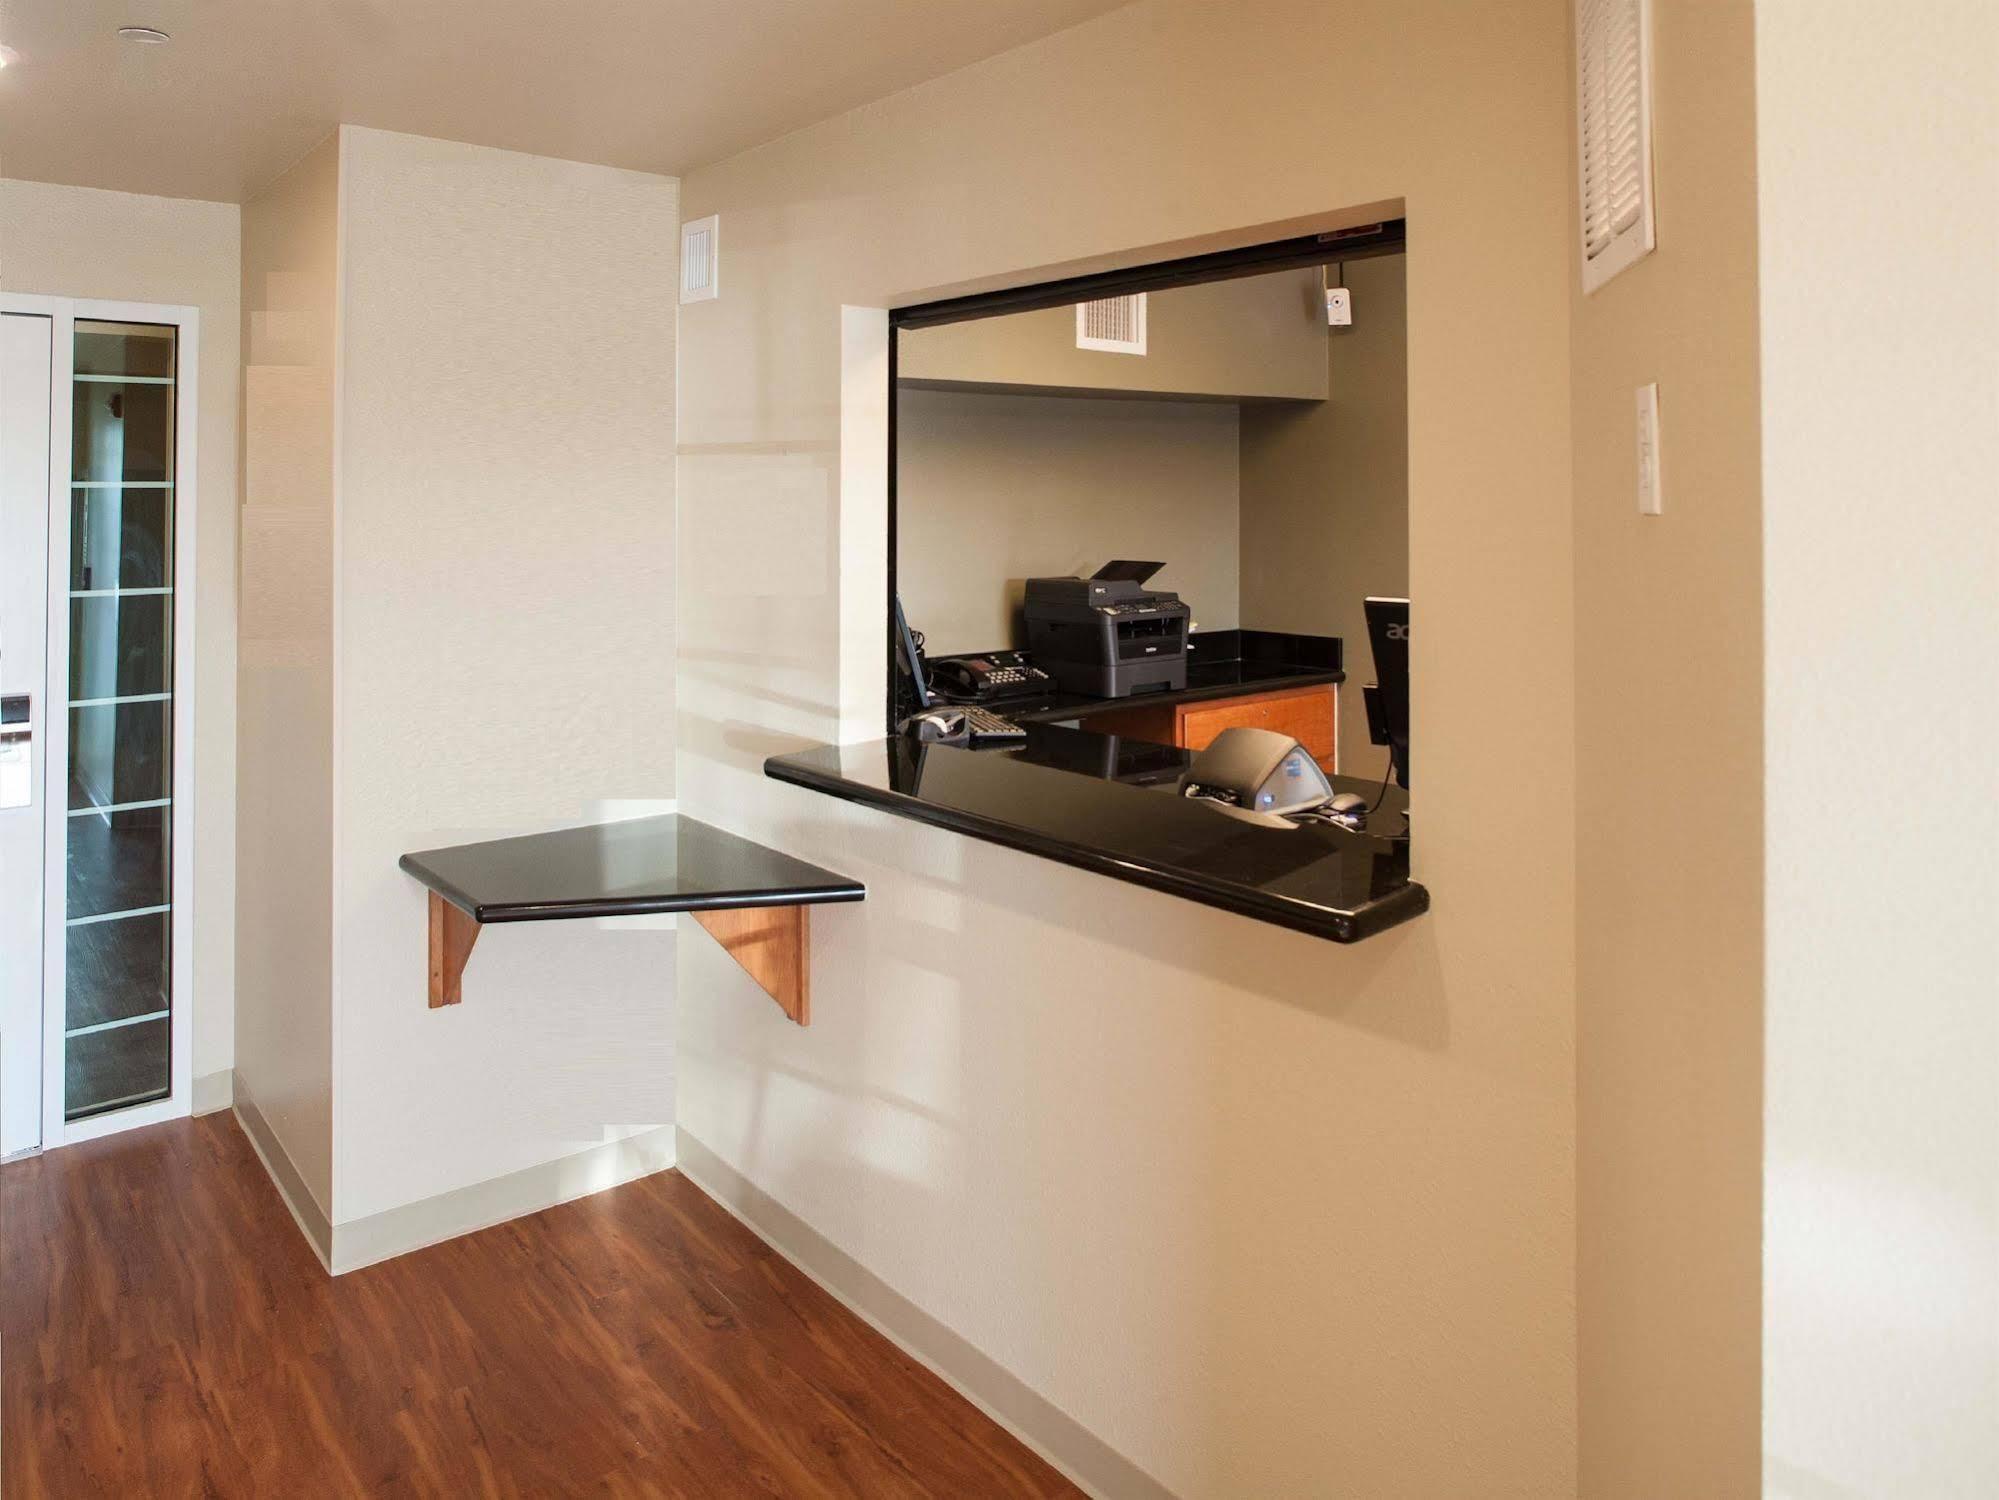 WoodSpring Suites Charlotte Gastonia